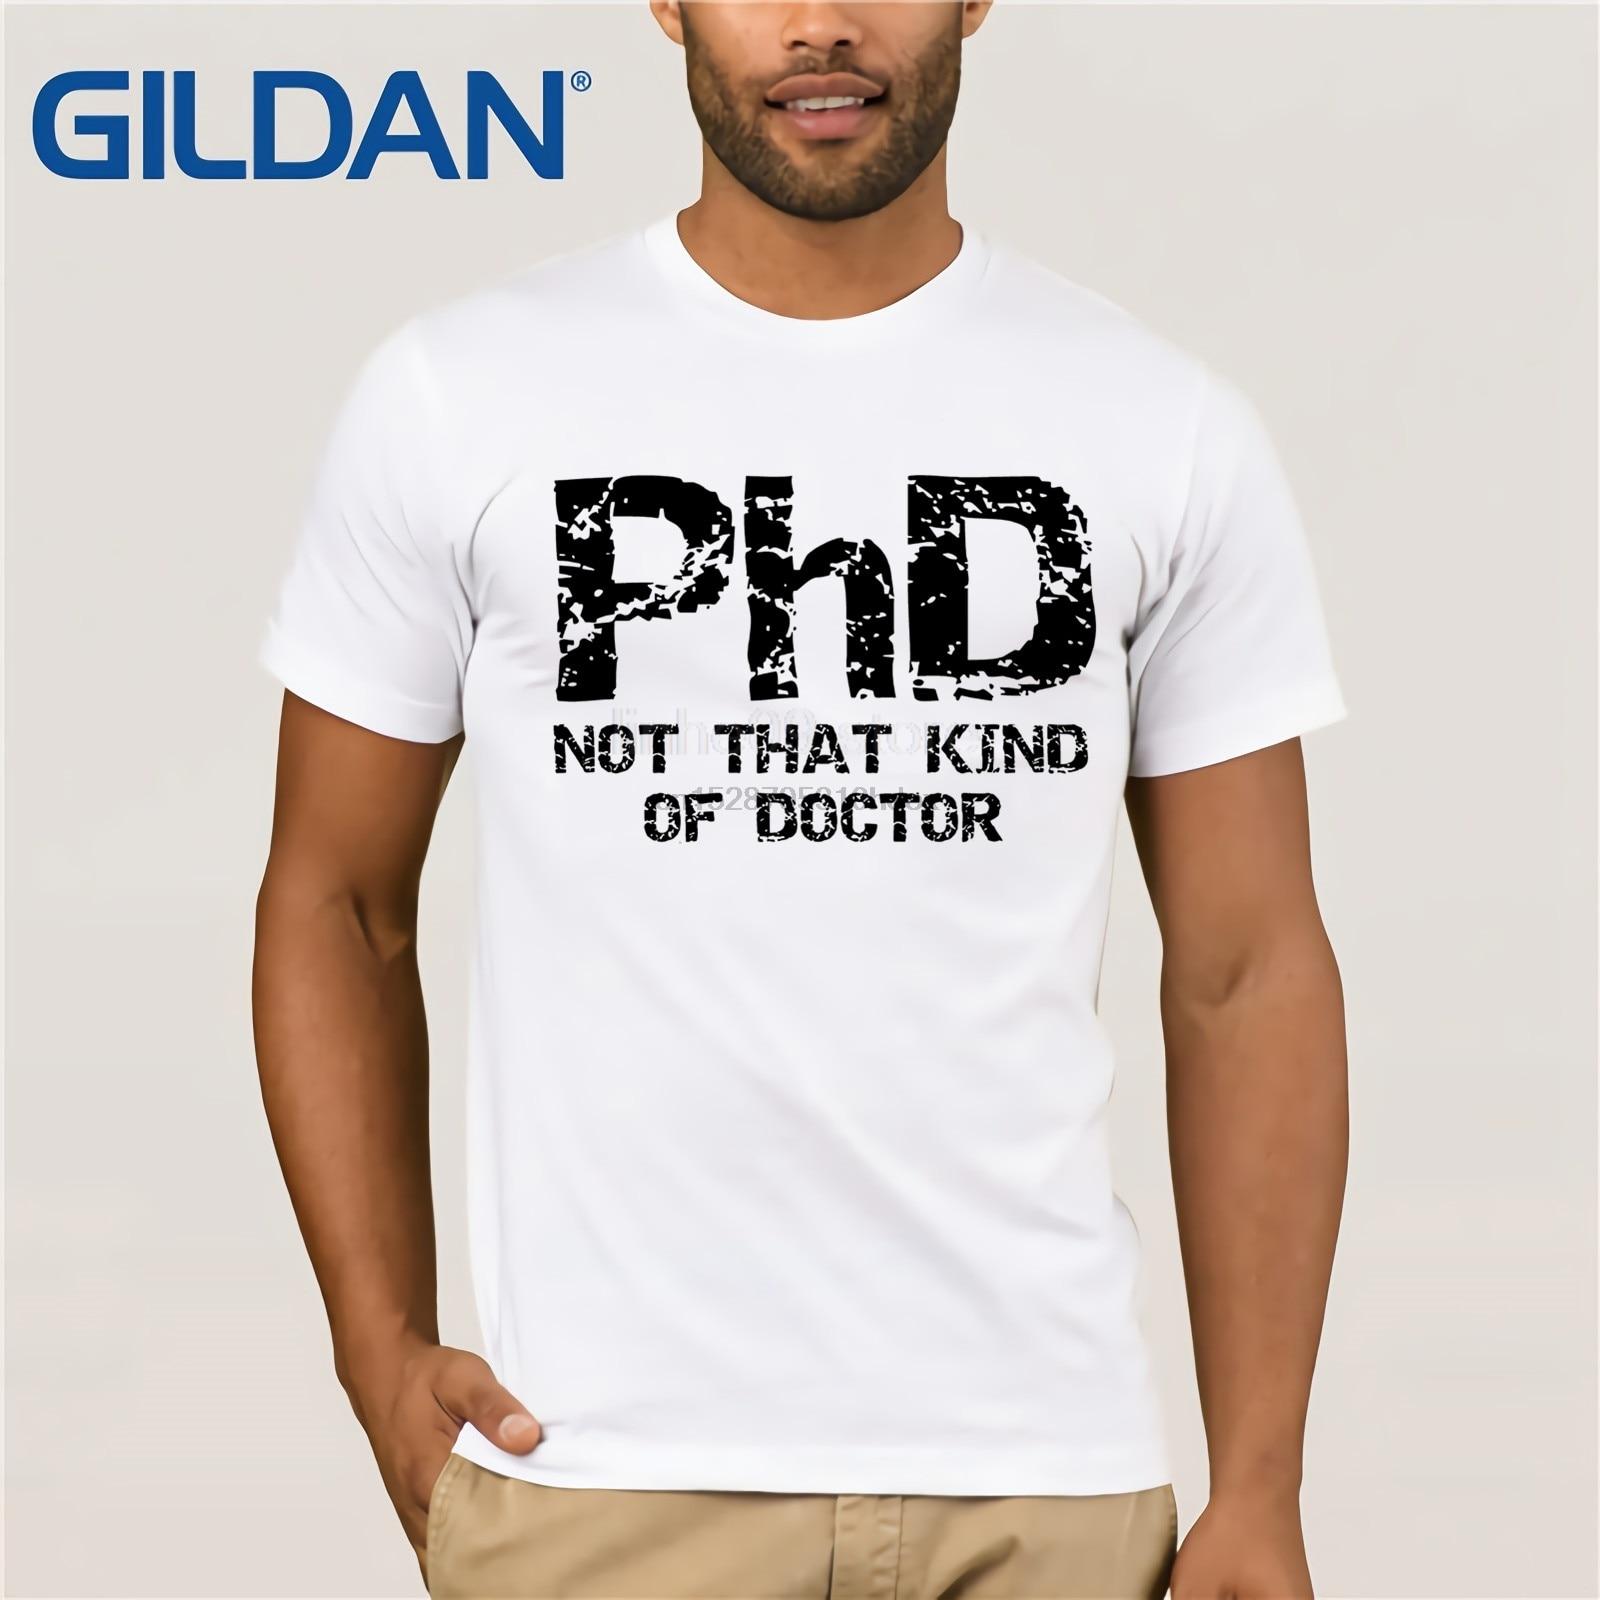 Phdt That Kind Of Doctor Shirt, забавный подарок, Ph D, футболка, высокое качество, Мужская футболка, модная летняя футболка